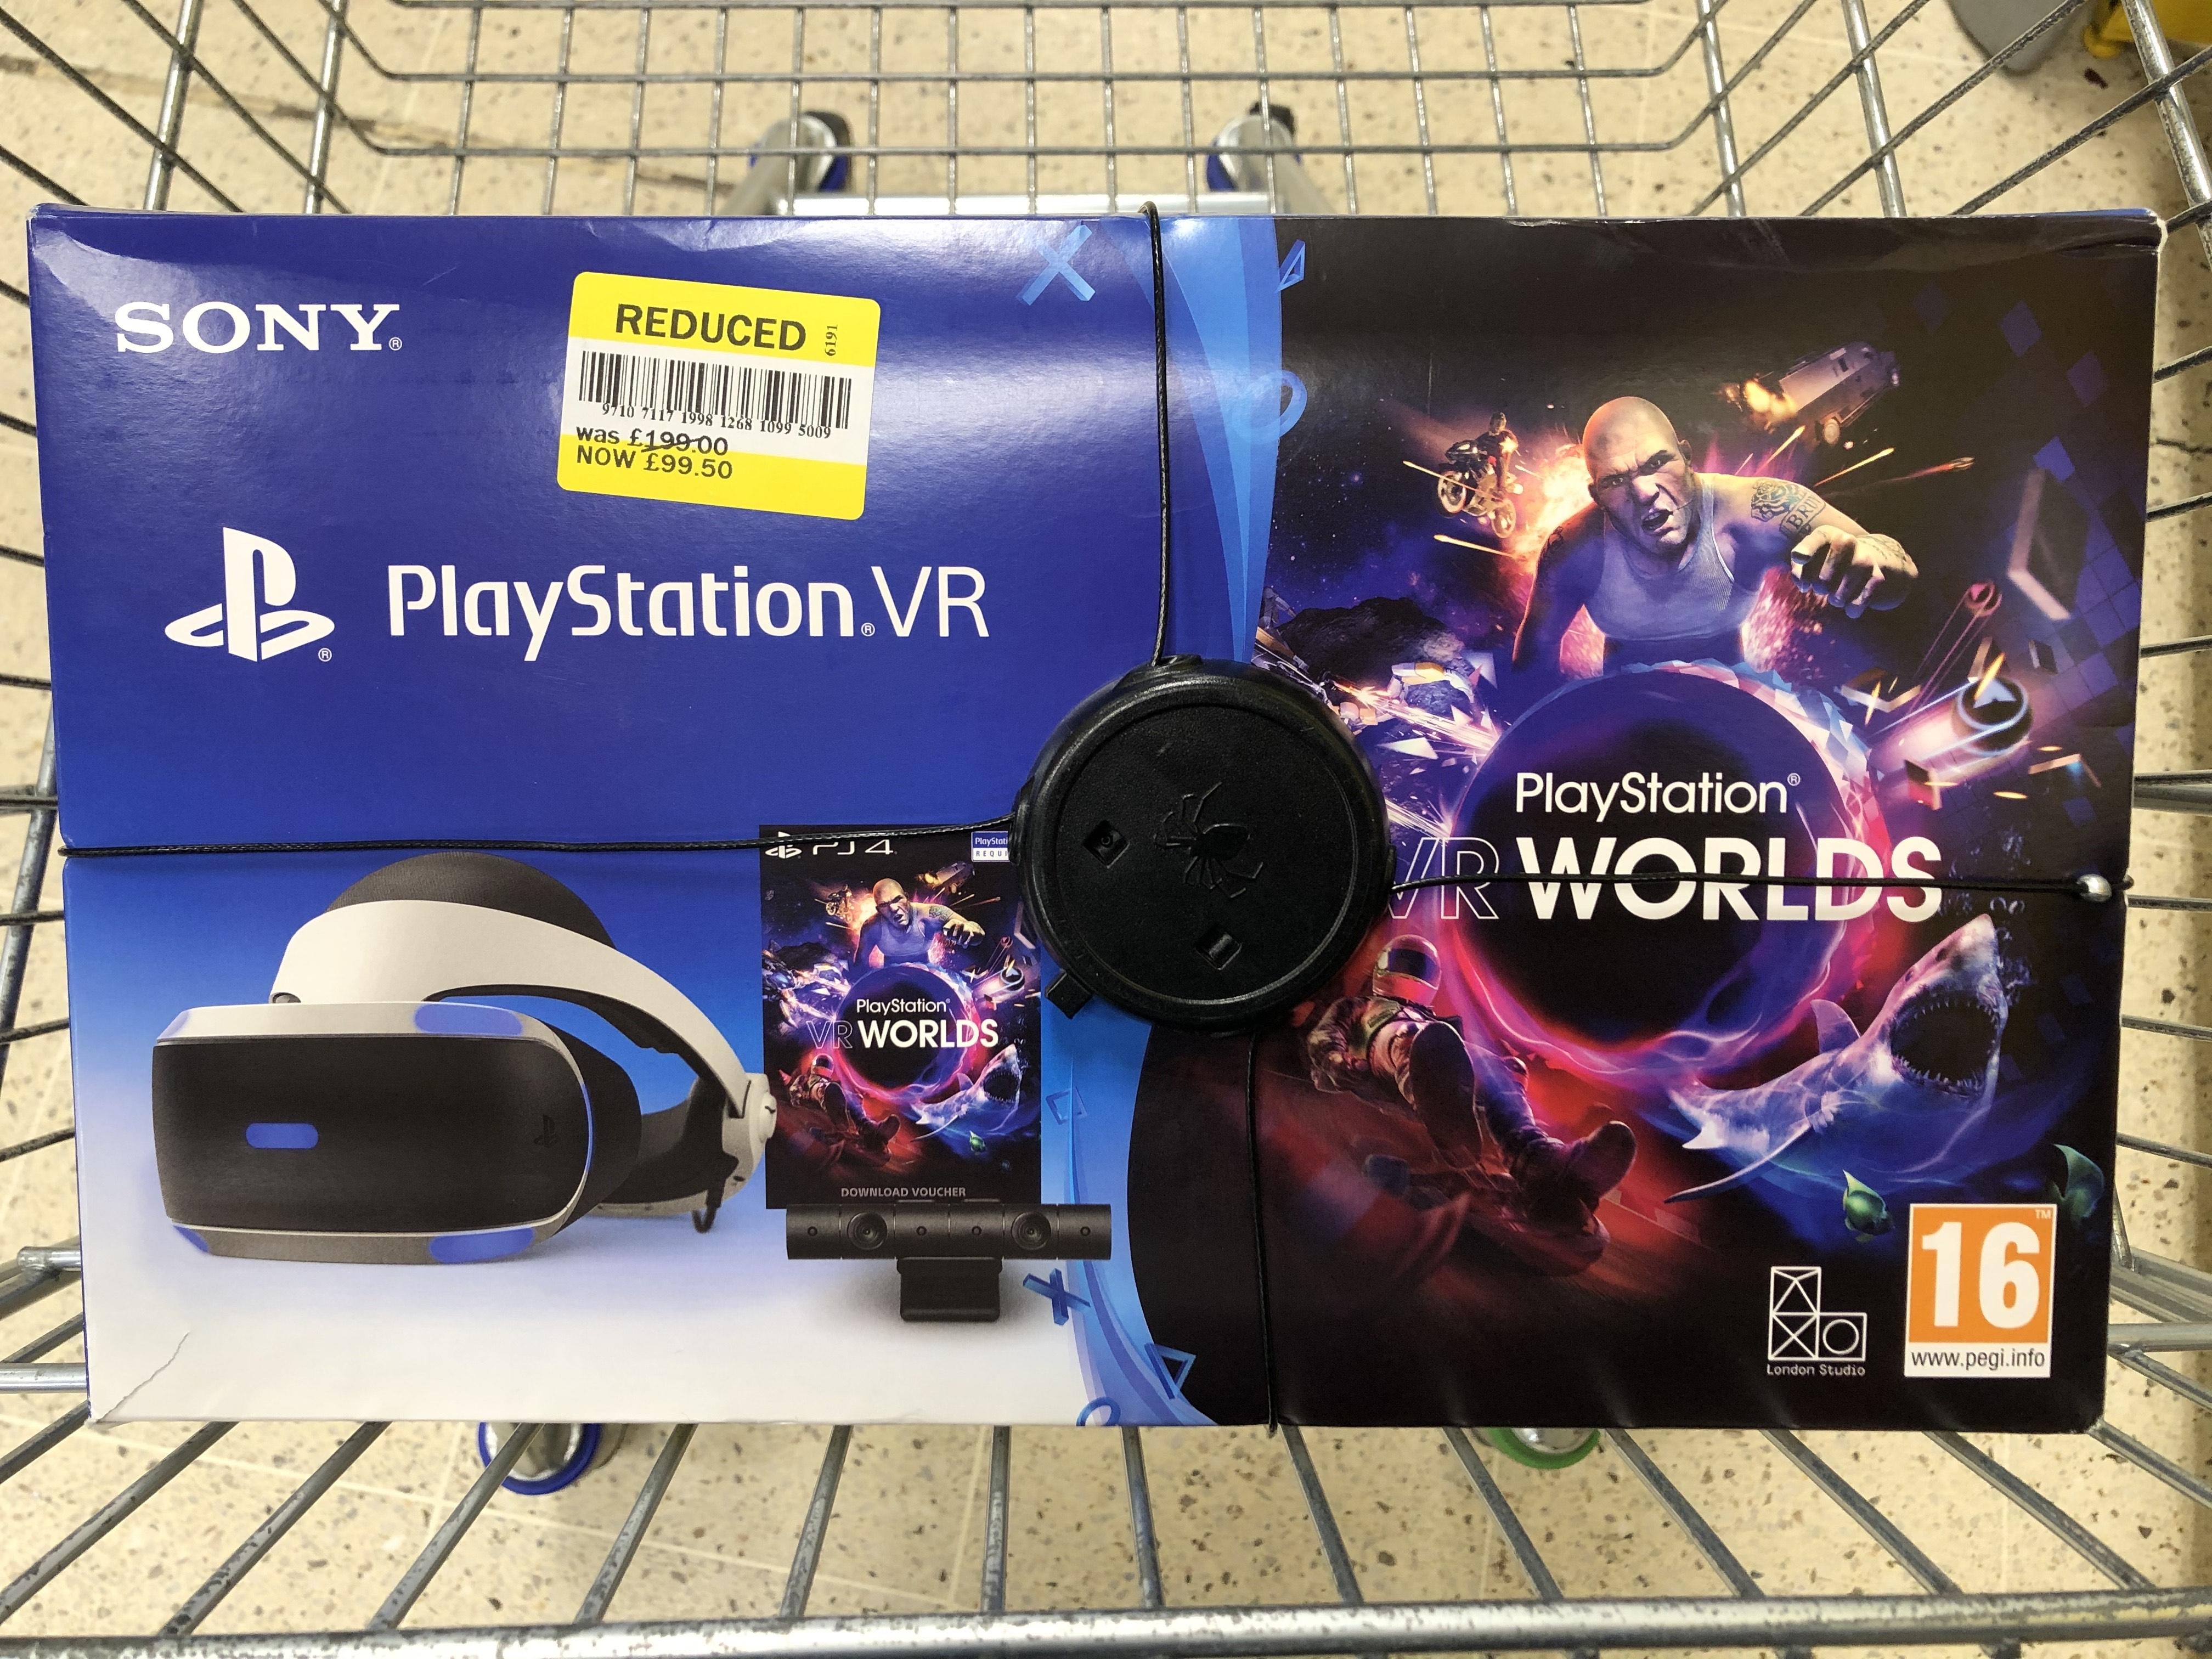 PlayStation VR Worlds - £99.50 yellow sticker in store @Tesco (Llandrindod, mid Wales)